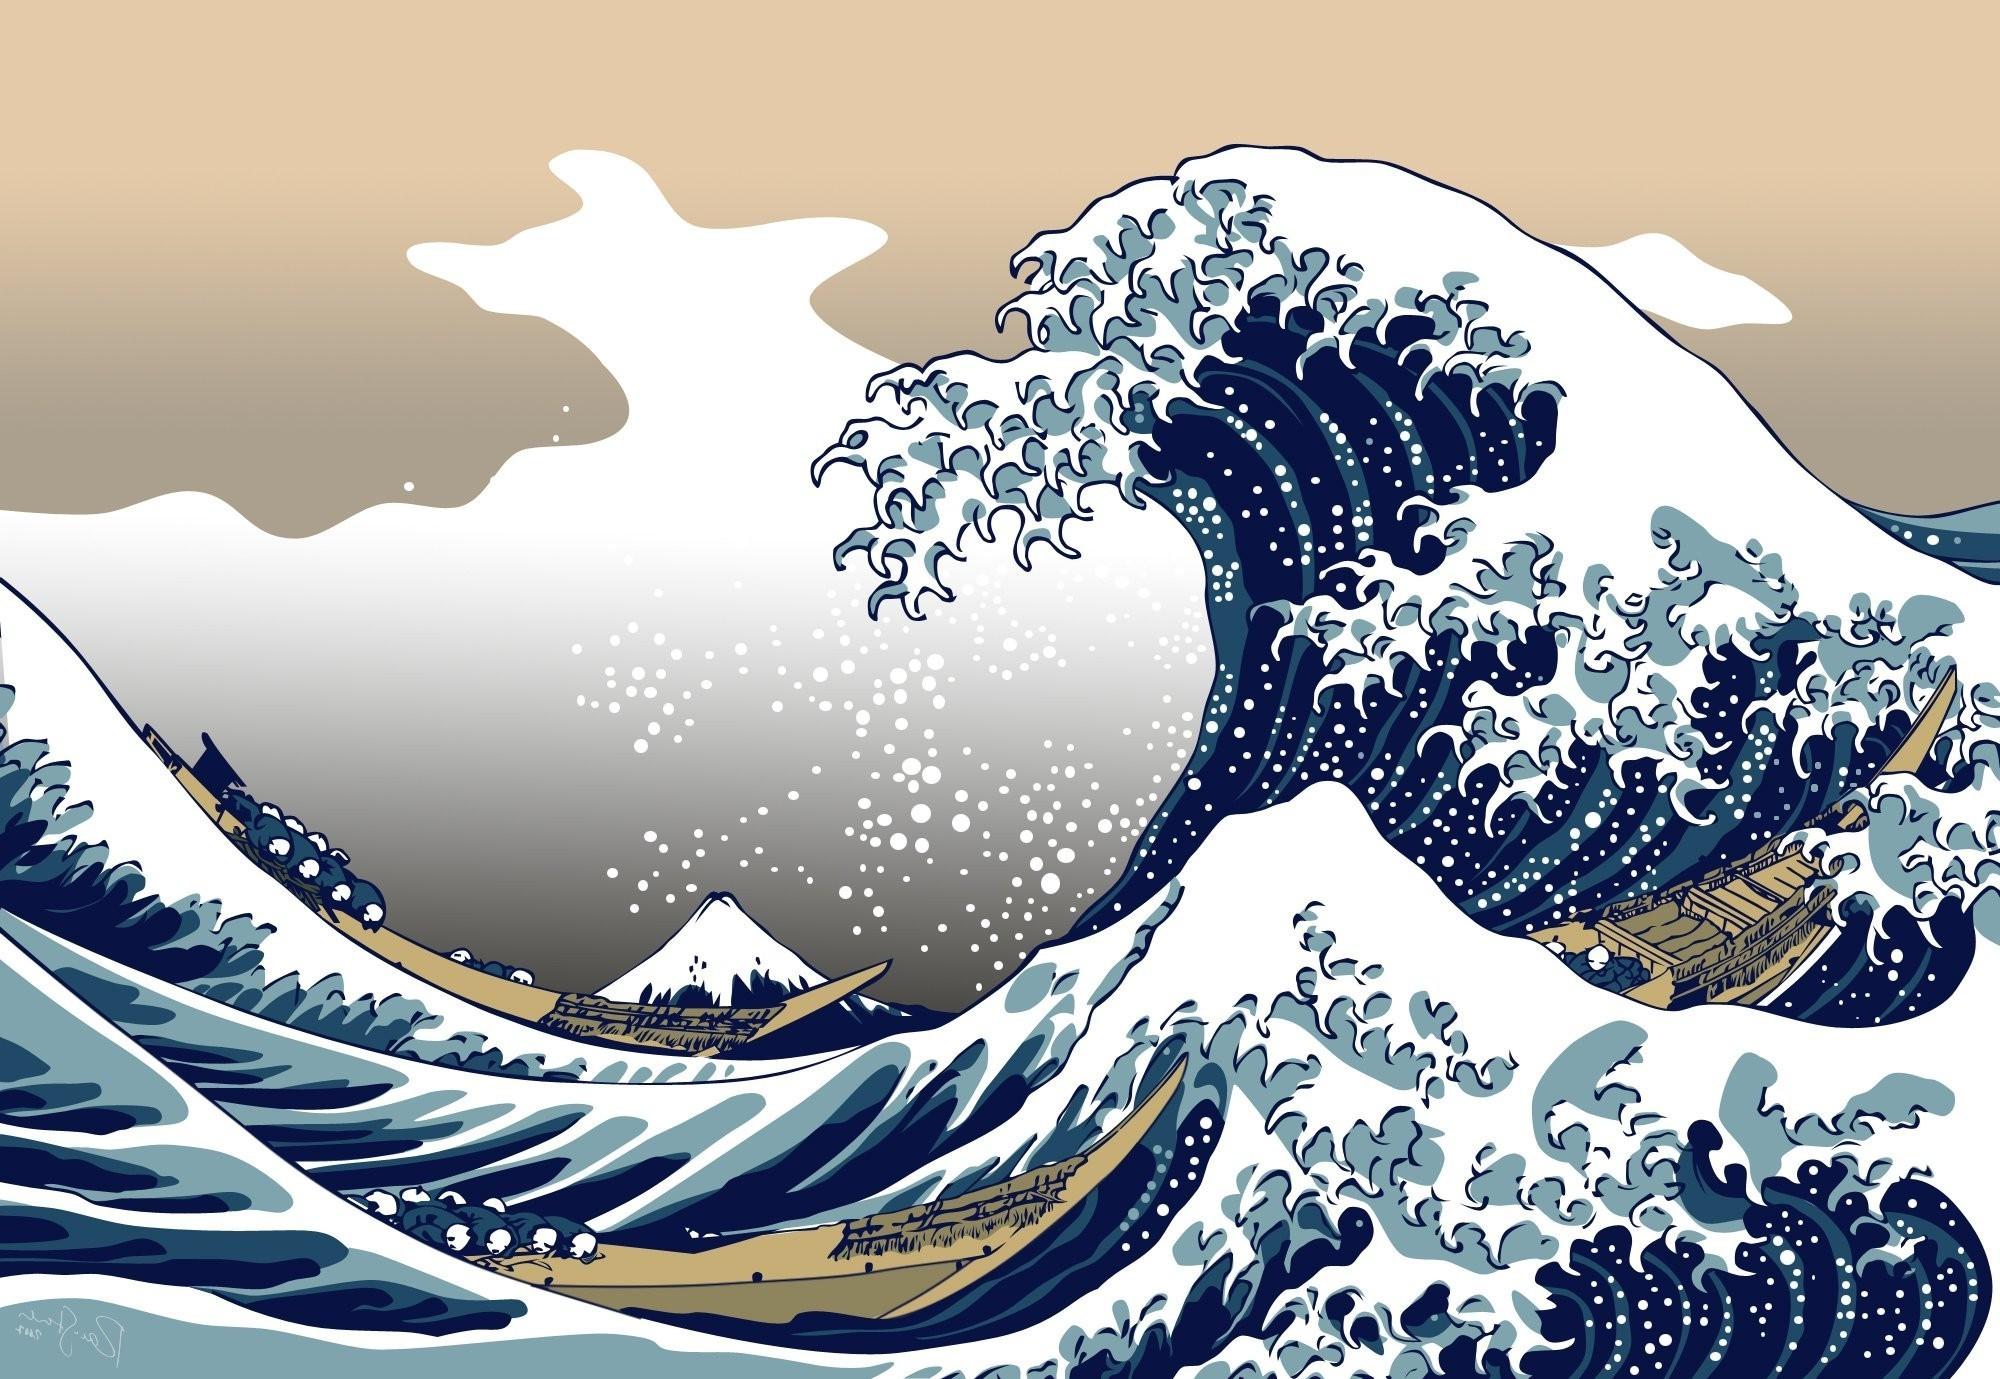 Nature, Blue, The Great Wave Off Kanagawa Wallpapers - Great Wave Off Kanagawa Wallpaper 4k - HD Wallpaper